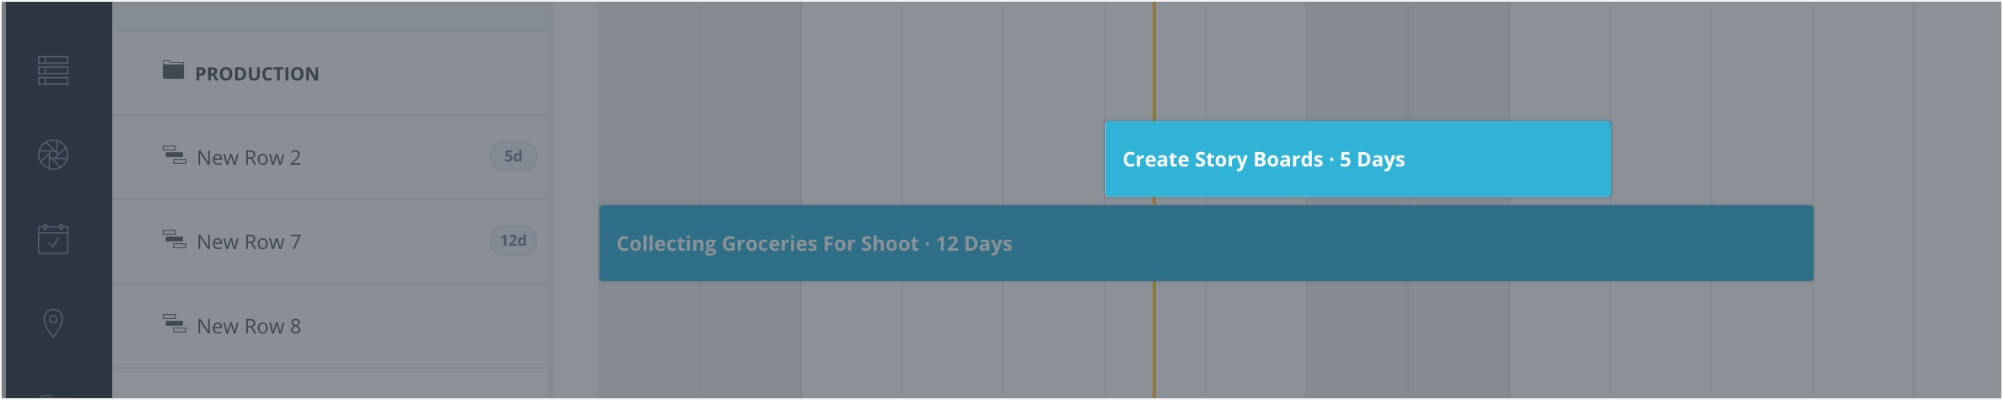 Film, Photo & Production Timeline - Add Due Dates B - StudioBinder